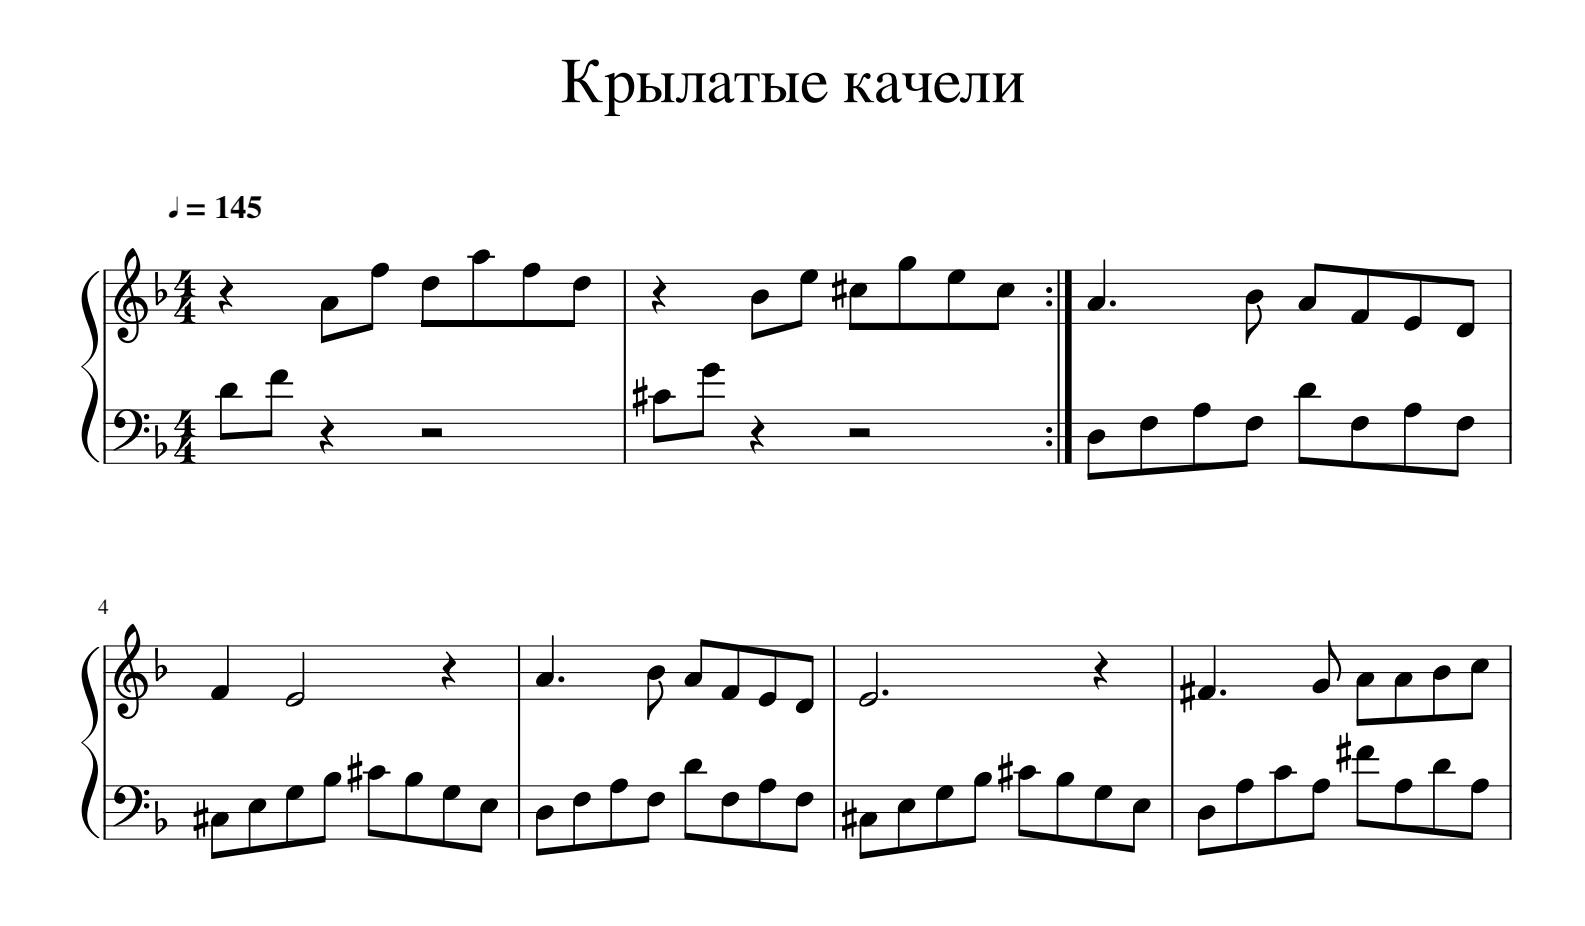 Winged Swing - Evgeny Krylatov